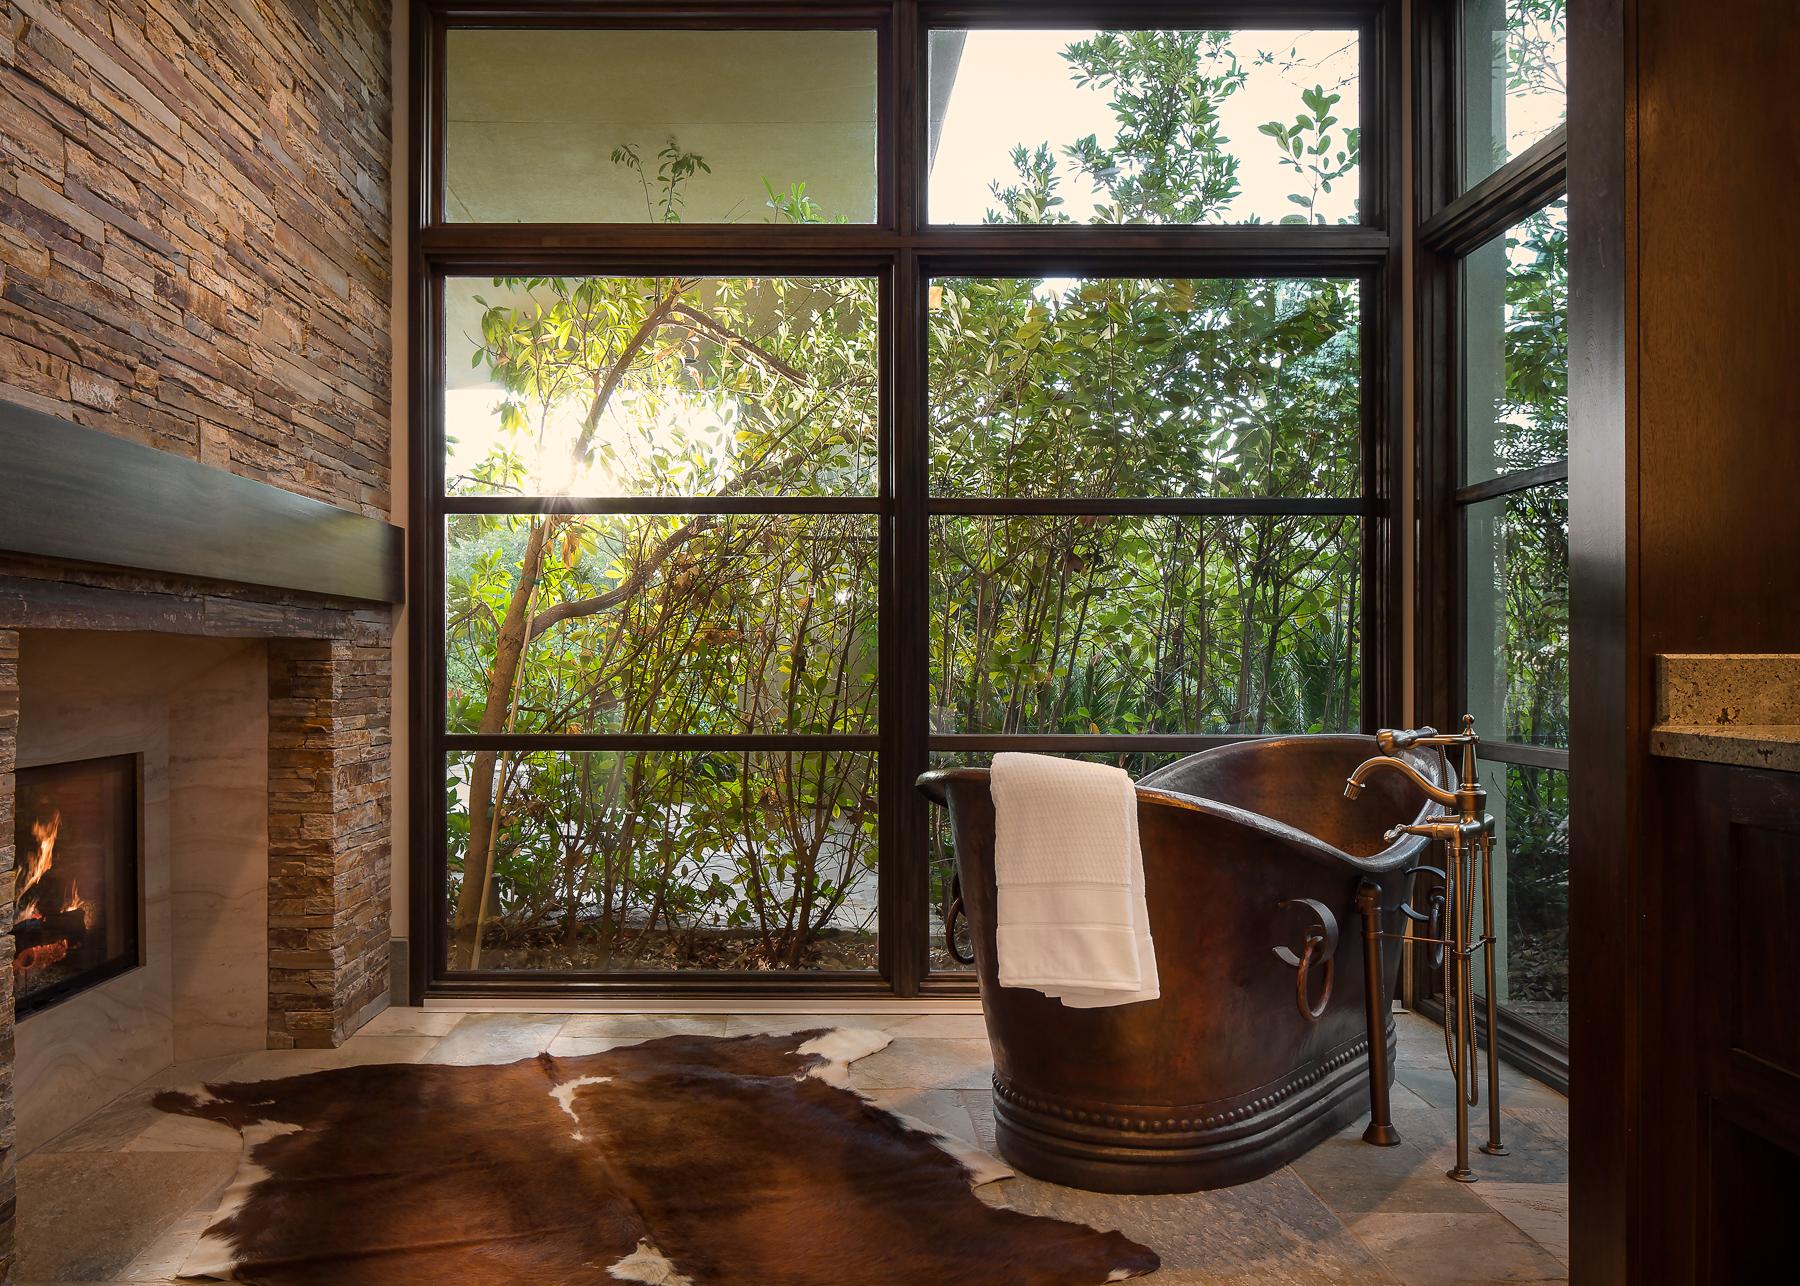 Bathtub and Fireplace